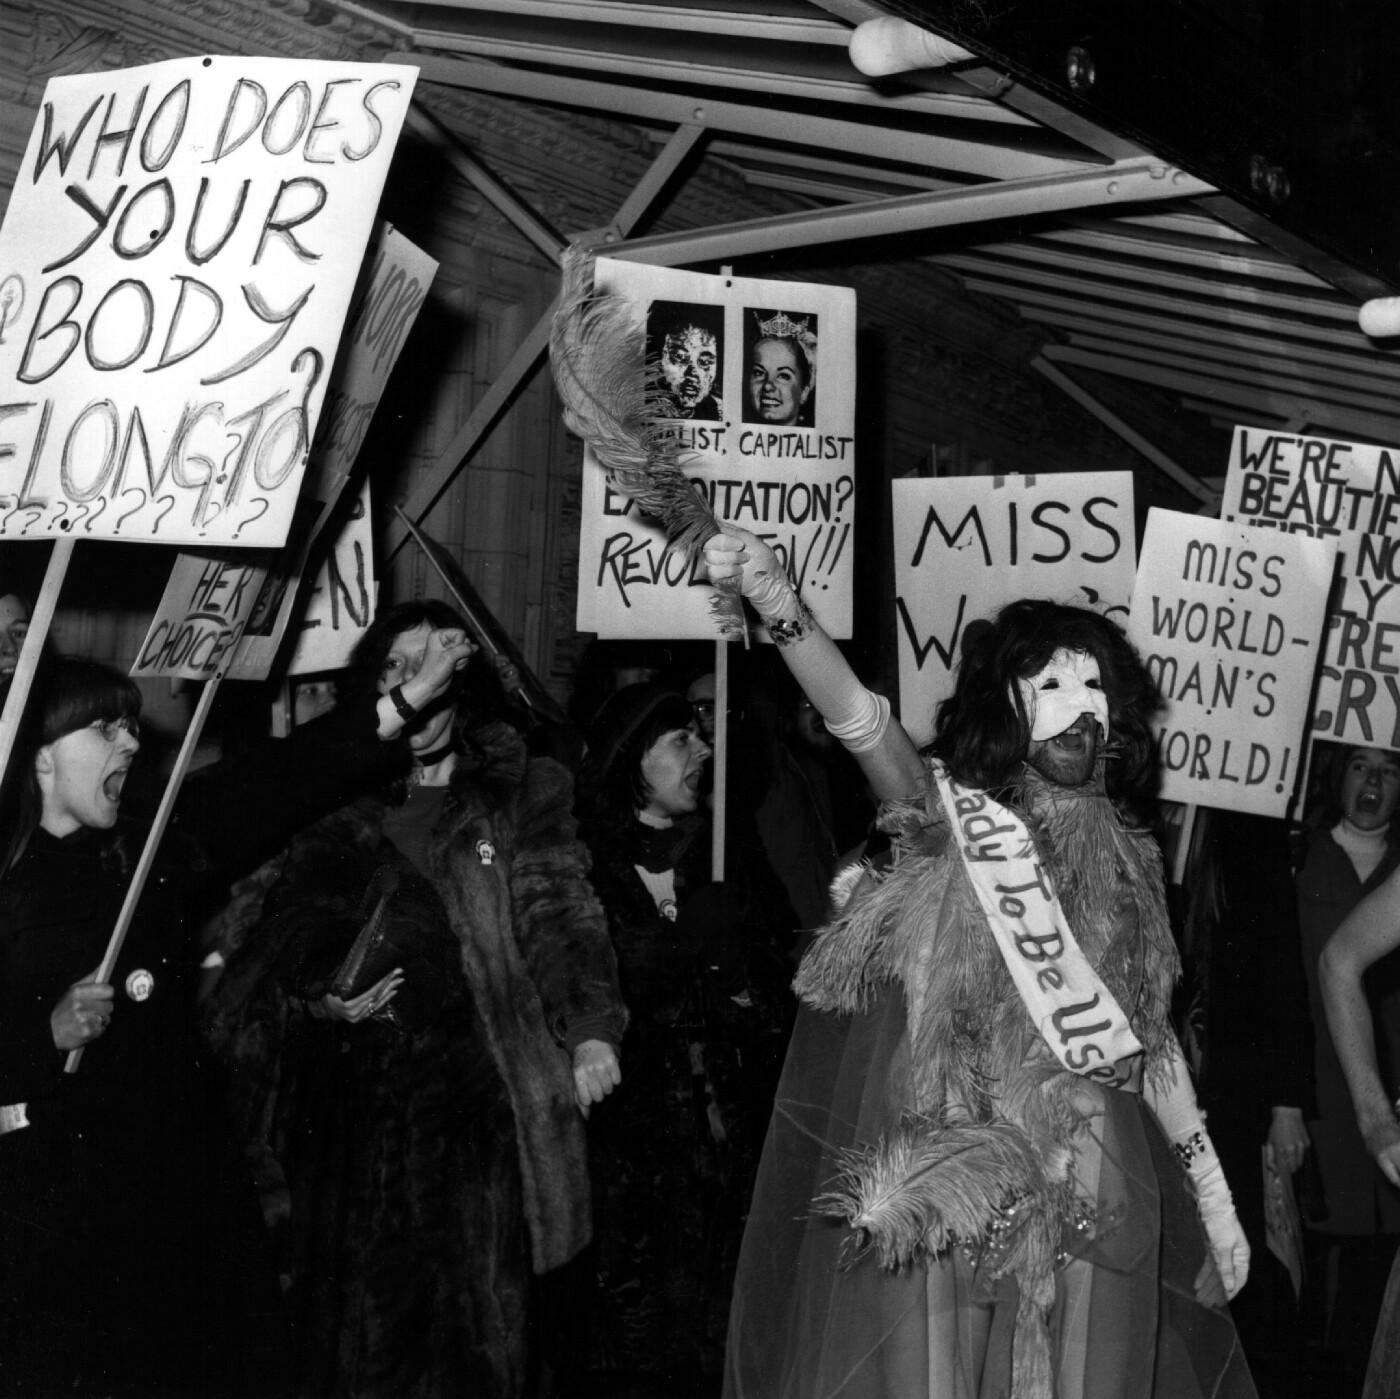 Miss World history 4 - protestors